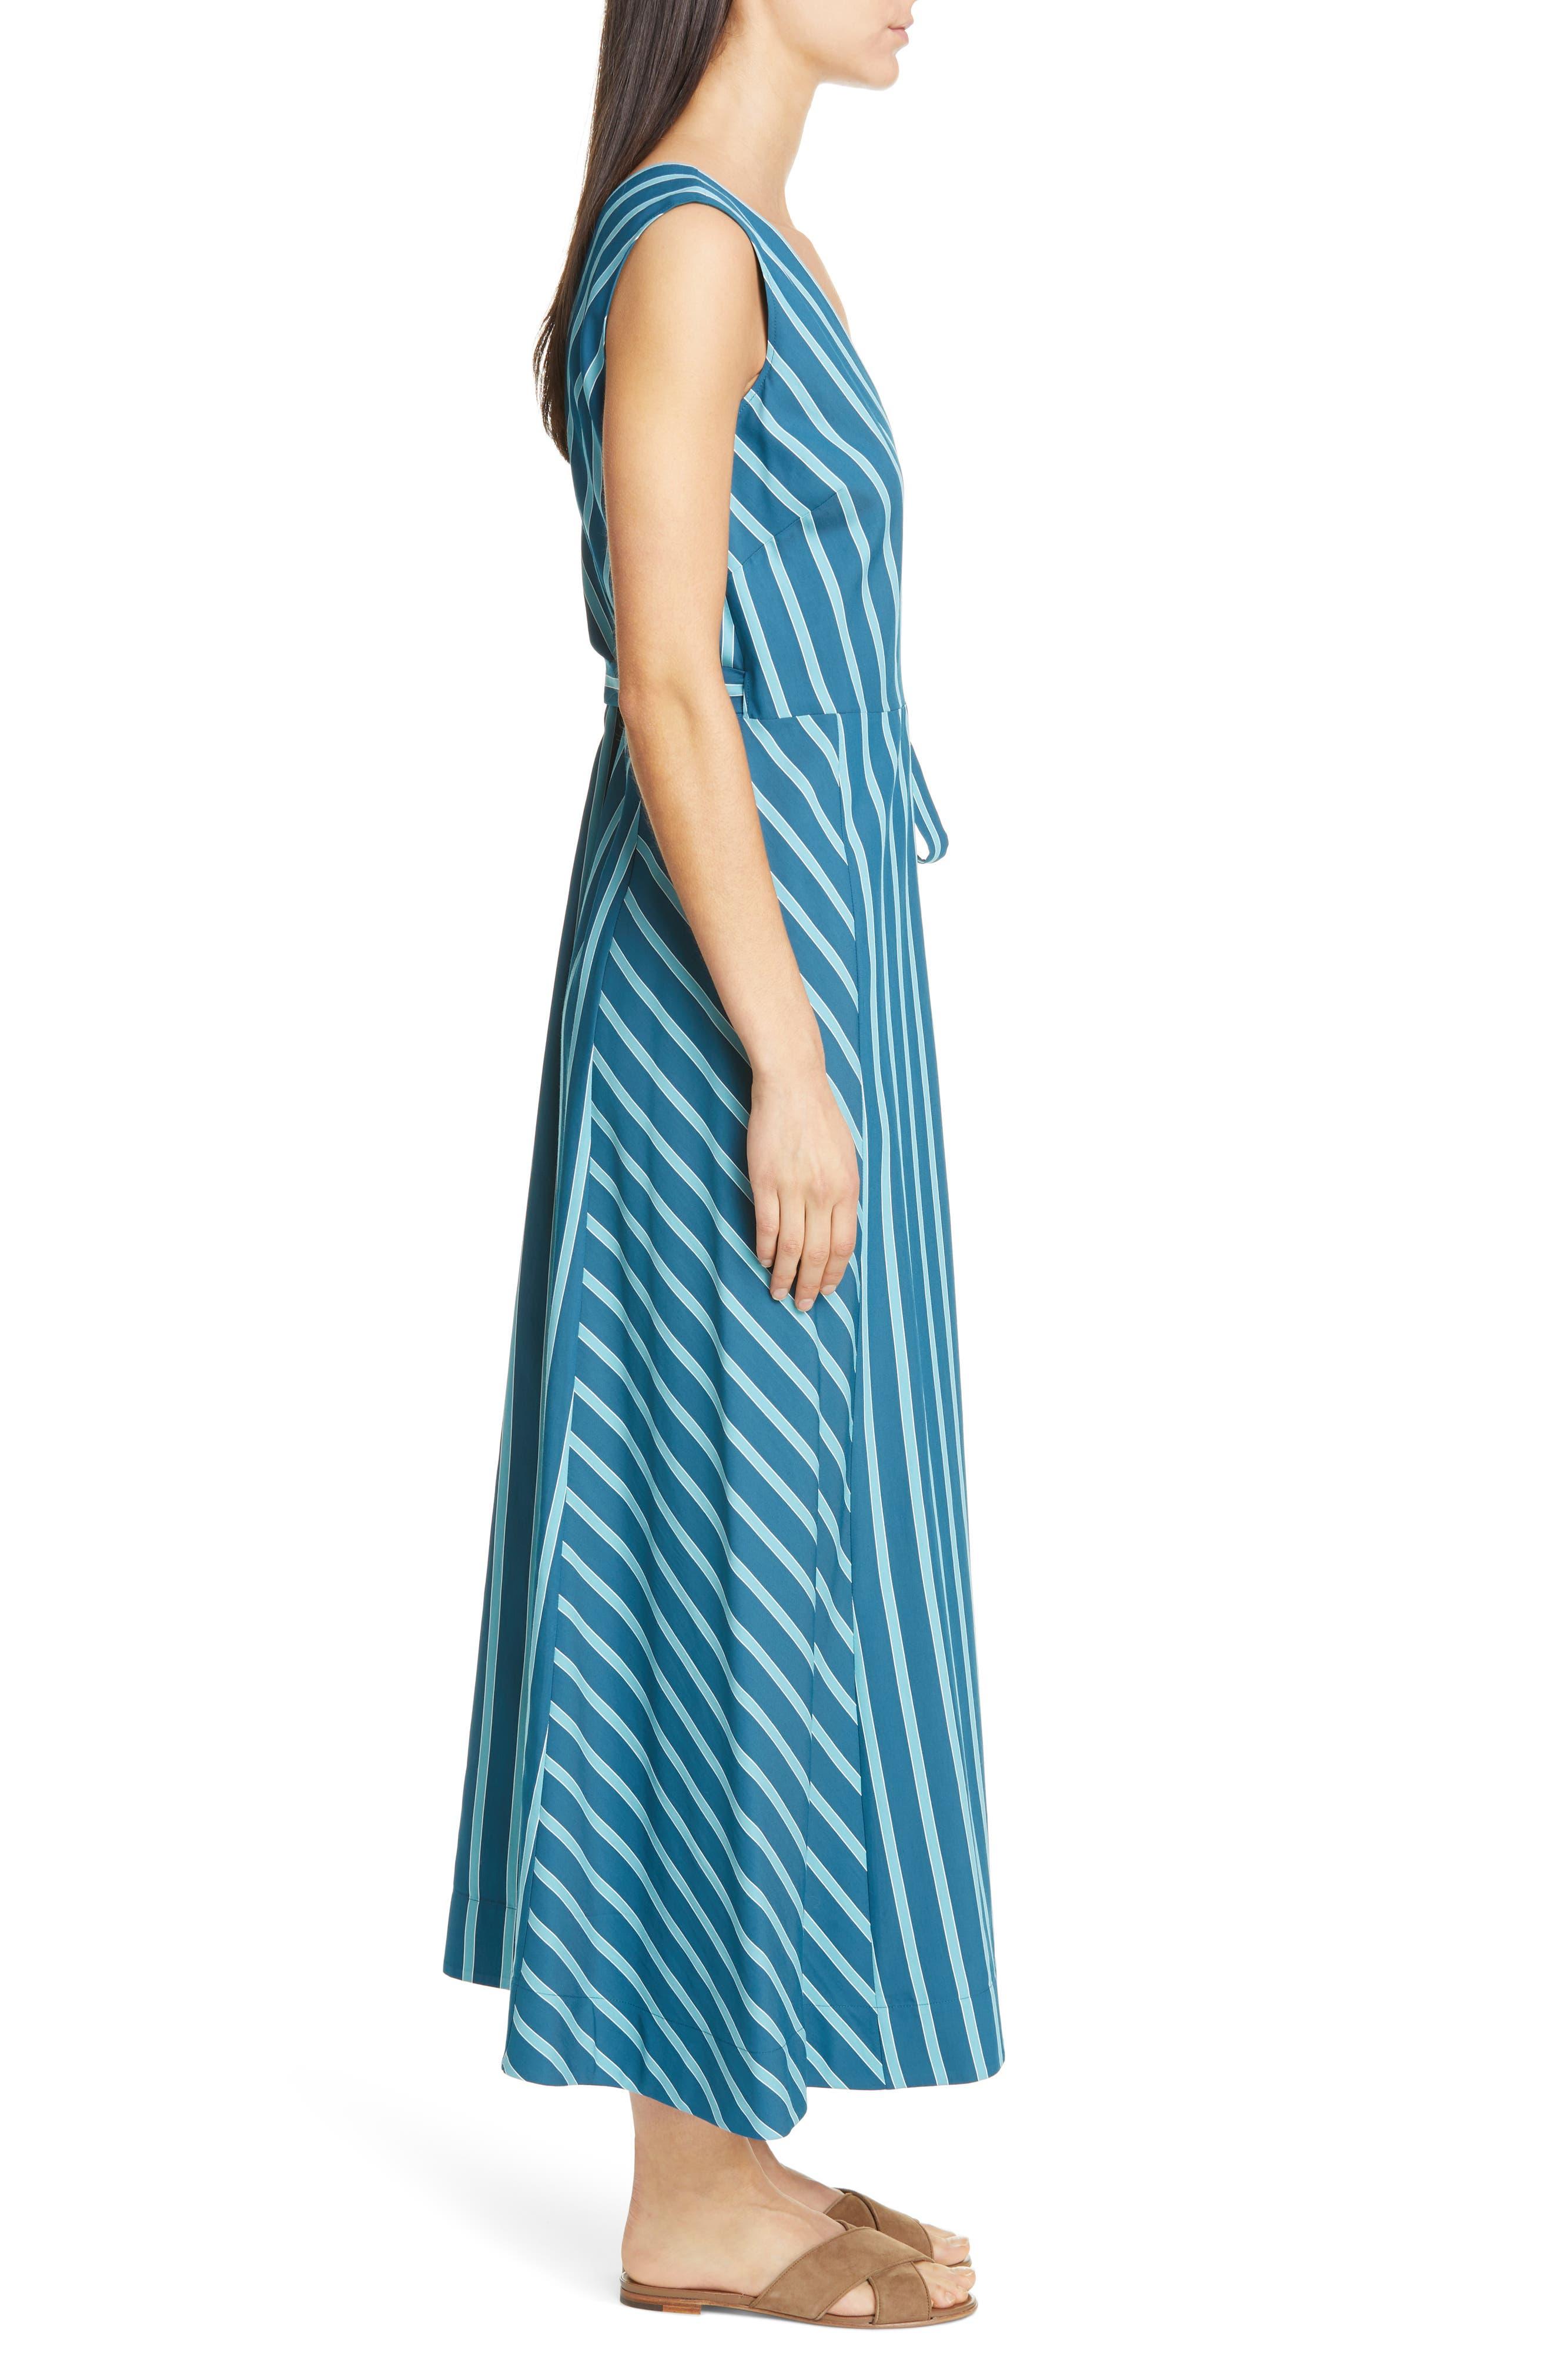 LAFAYETTE 148 NEW YORK, Siri Wrap Dress, Alternate thumbnail 4, color, PACIFIC MULTI